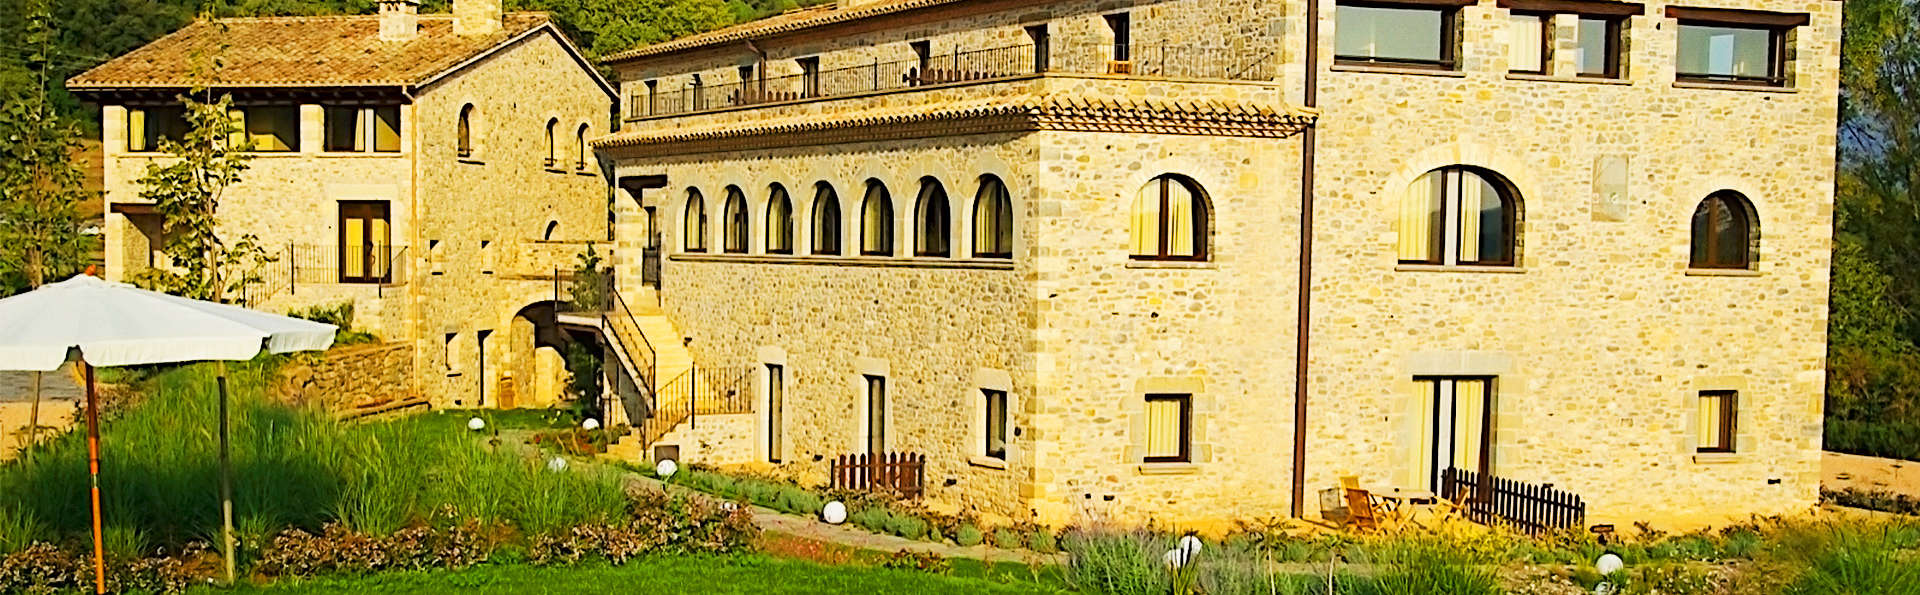 L'Arcada de Fares - EDIT_2_FACHADA.jpg